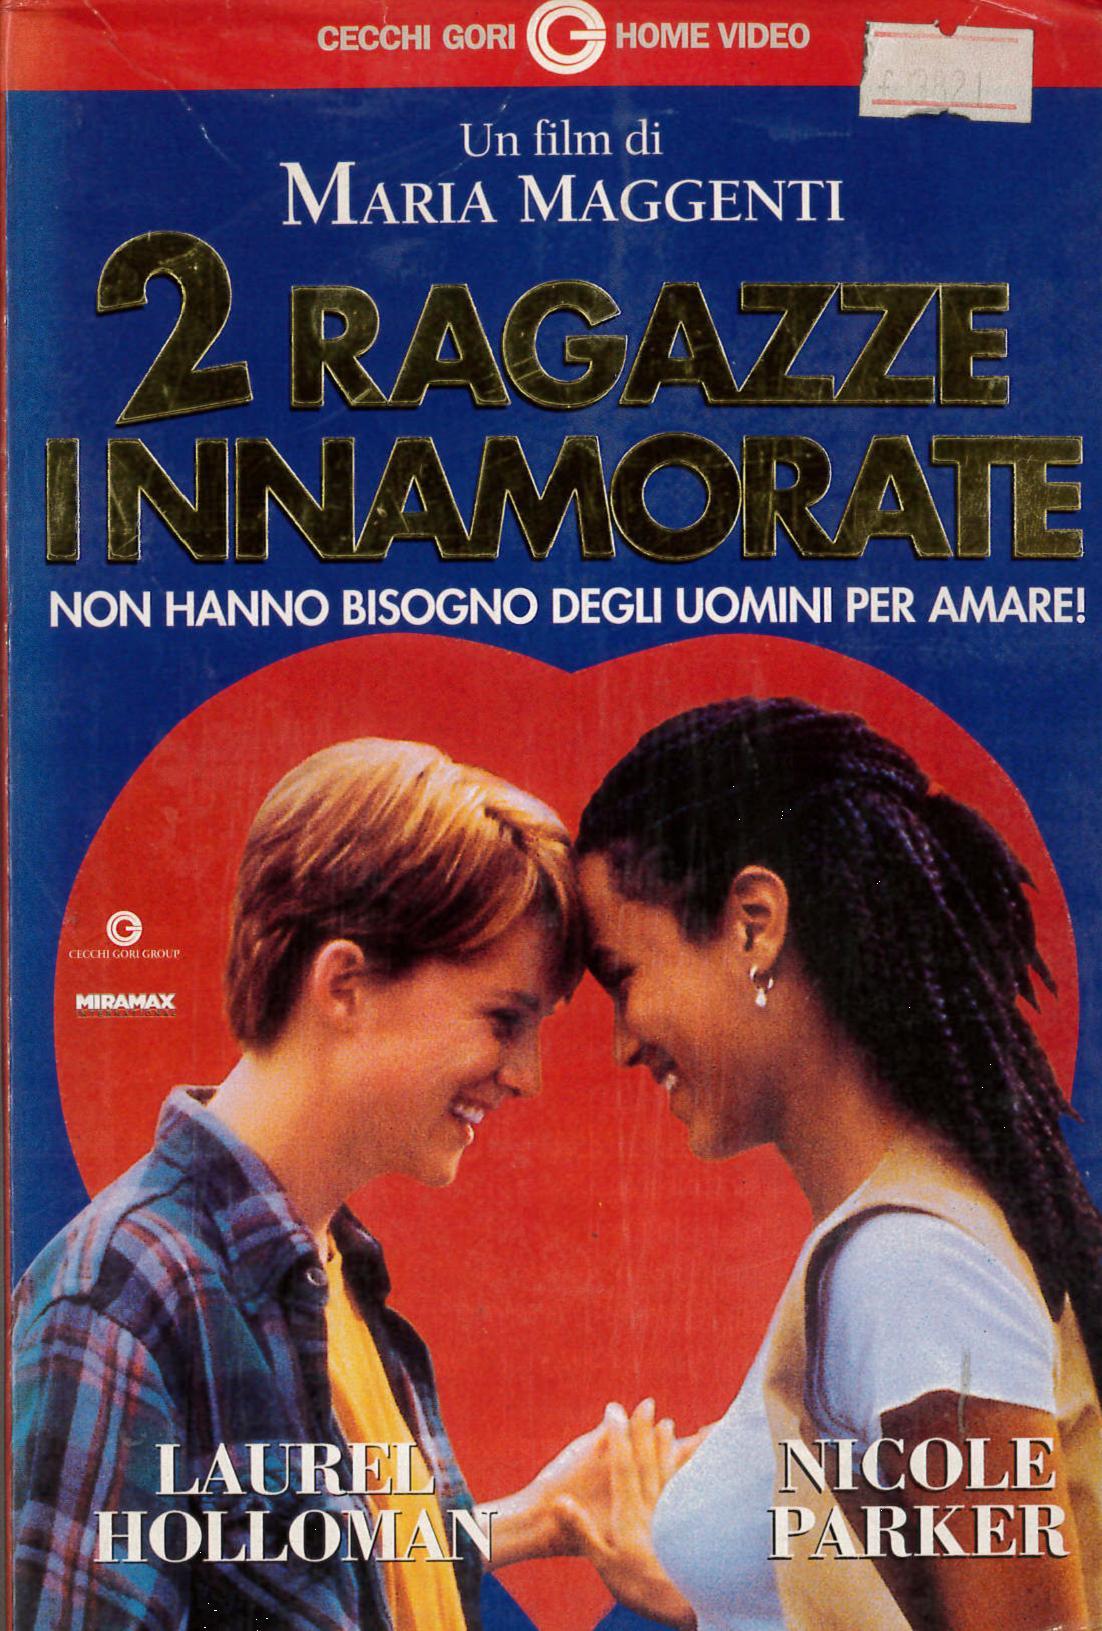 2 RAGAZZE INNAMORATE fc (VHS)